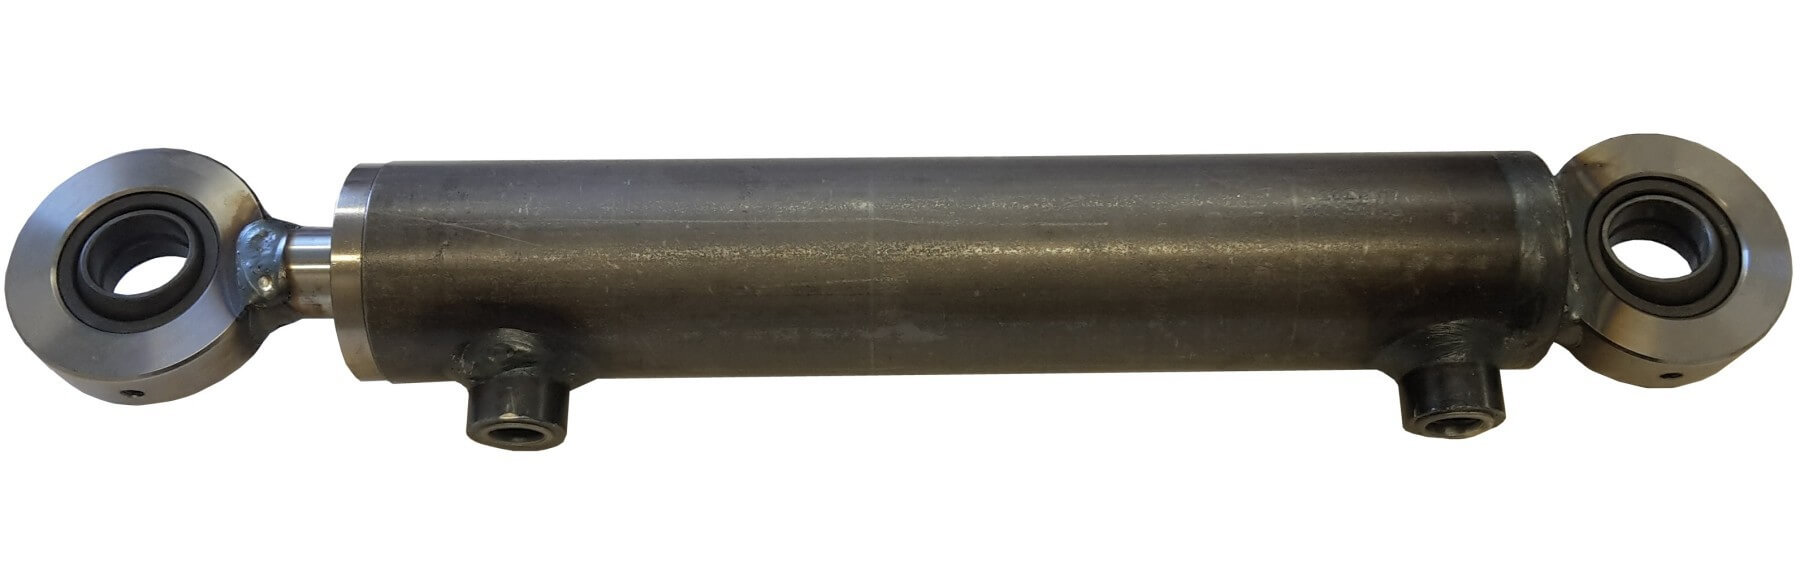 Hydraulisylinteri CL 50. 25. 300 GE